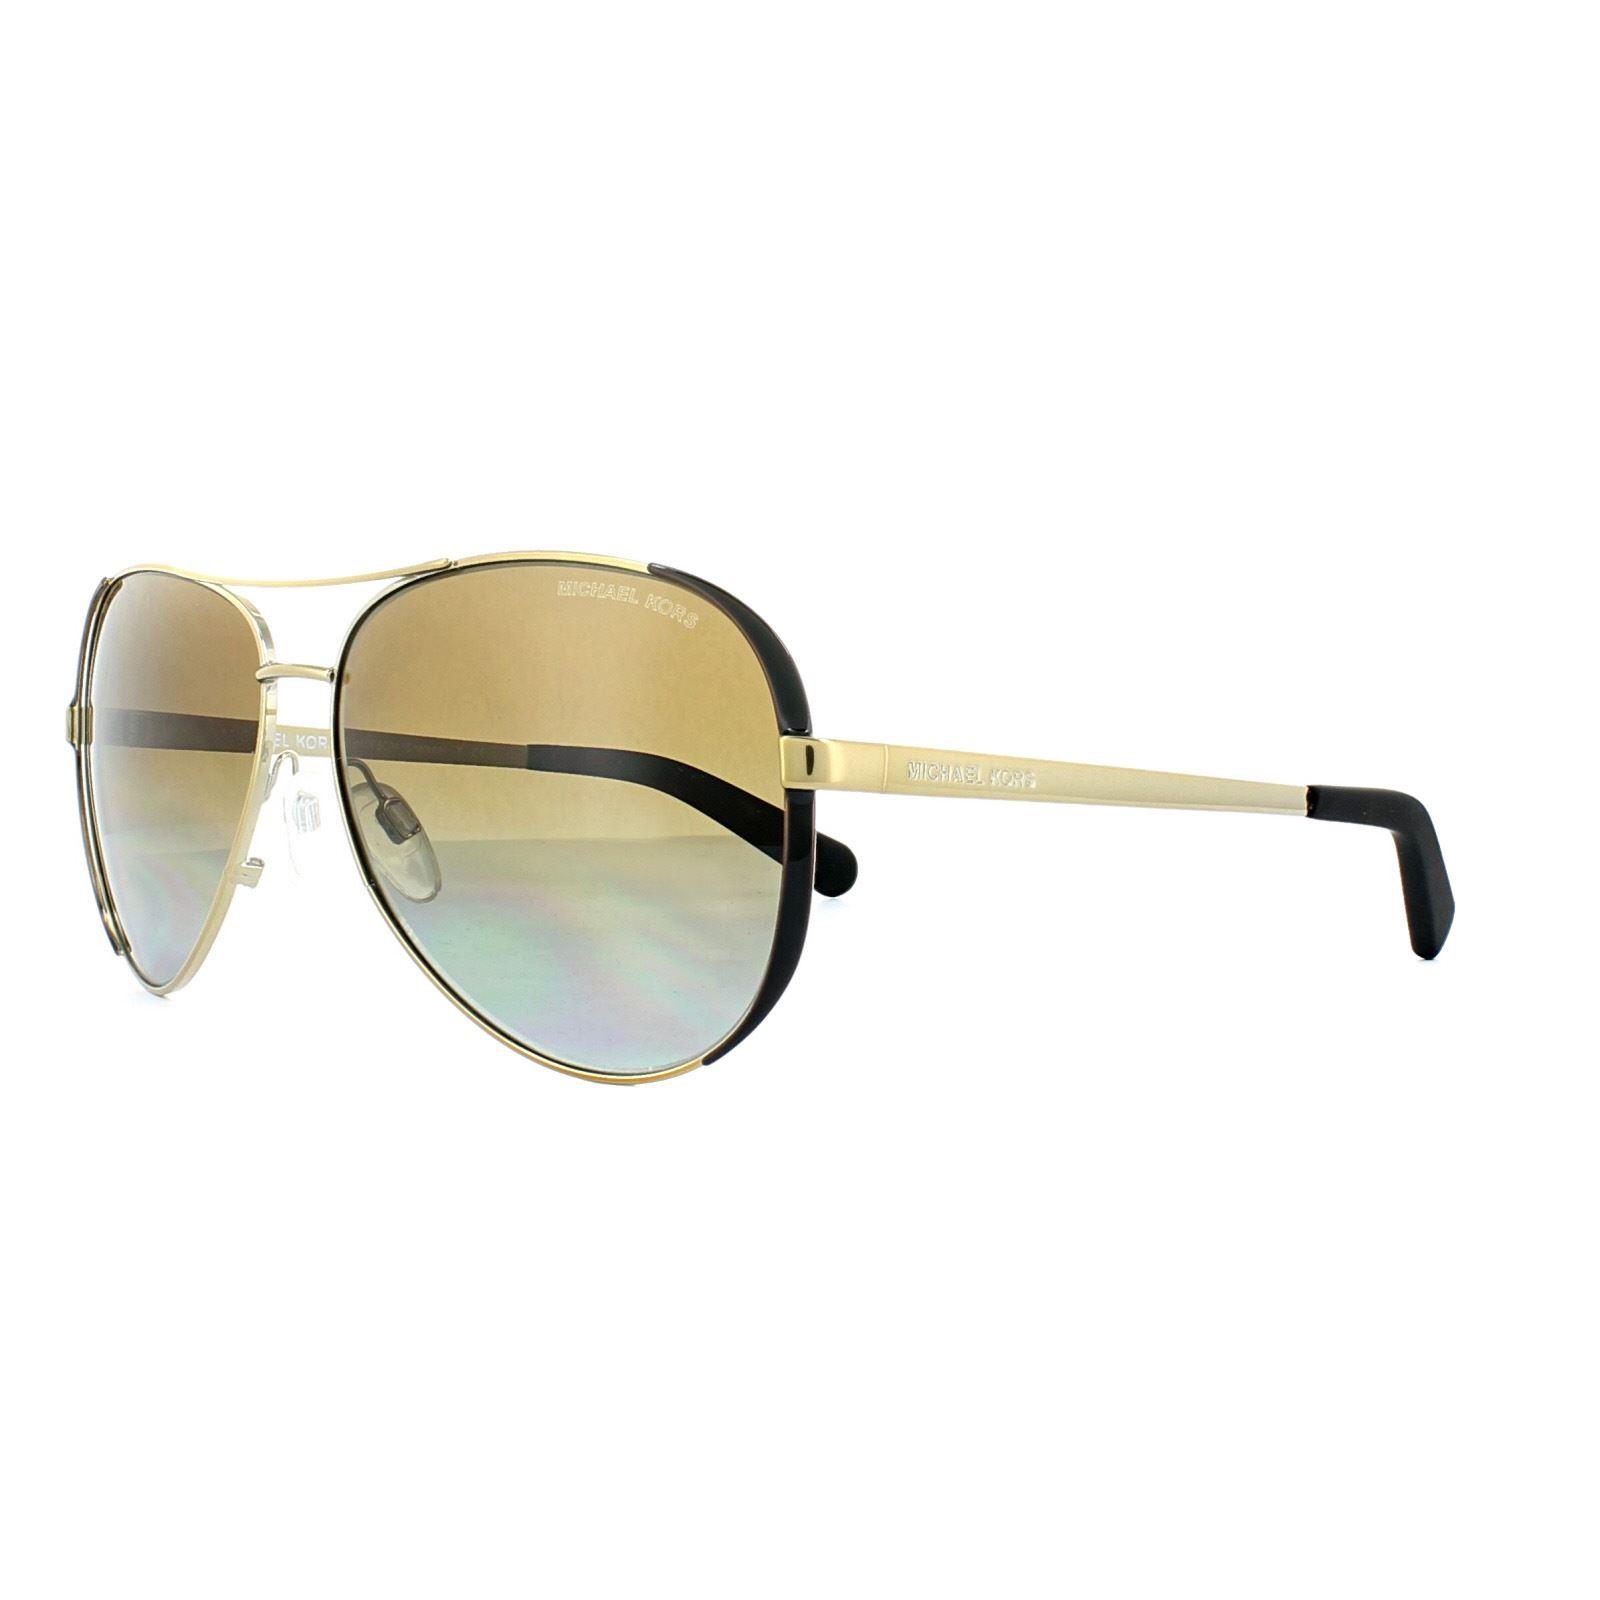 Michael Kors Sunglasses Chelsea 5004 1014/T5 Gold Dark Chocolate Brown Gradient Polarized